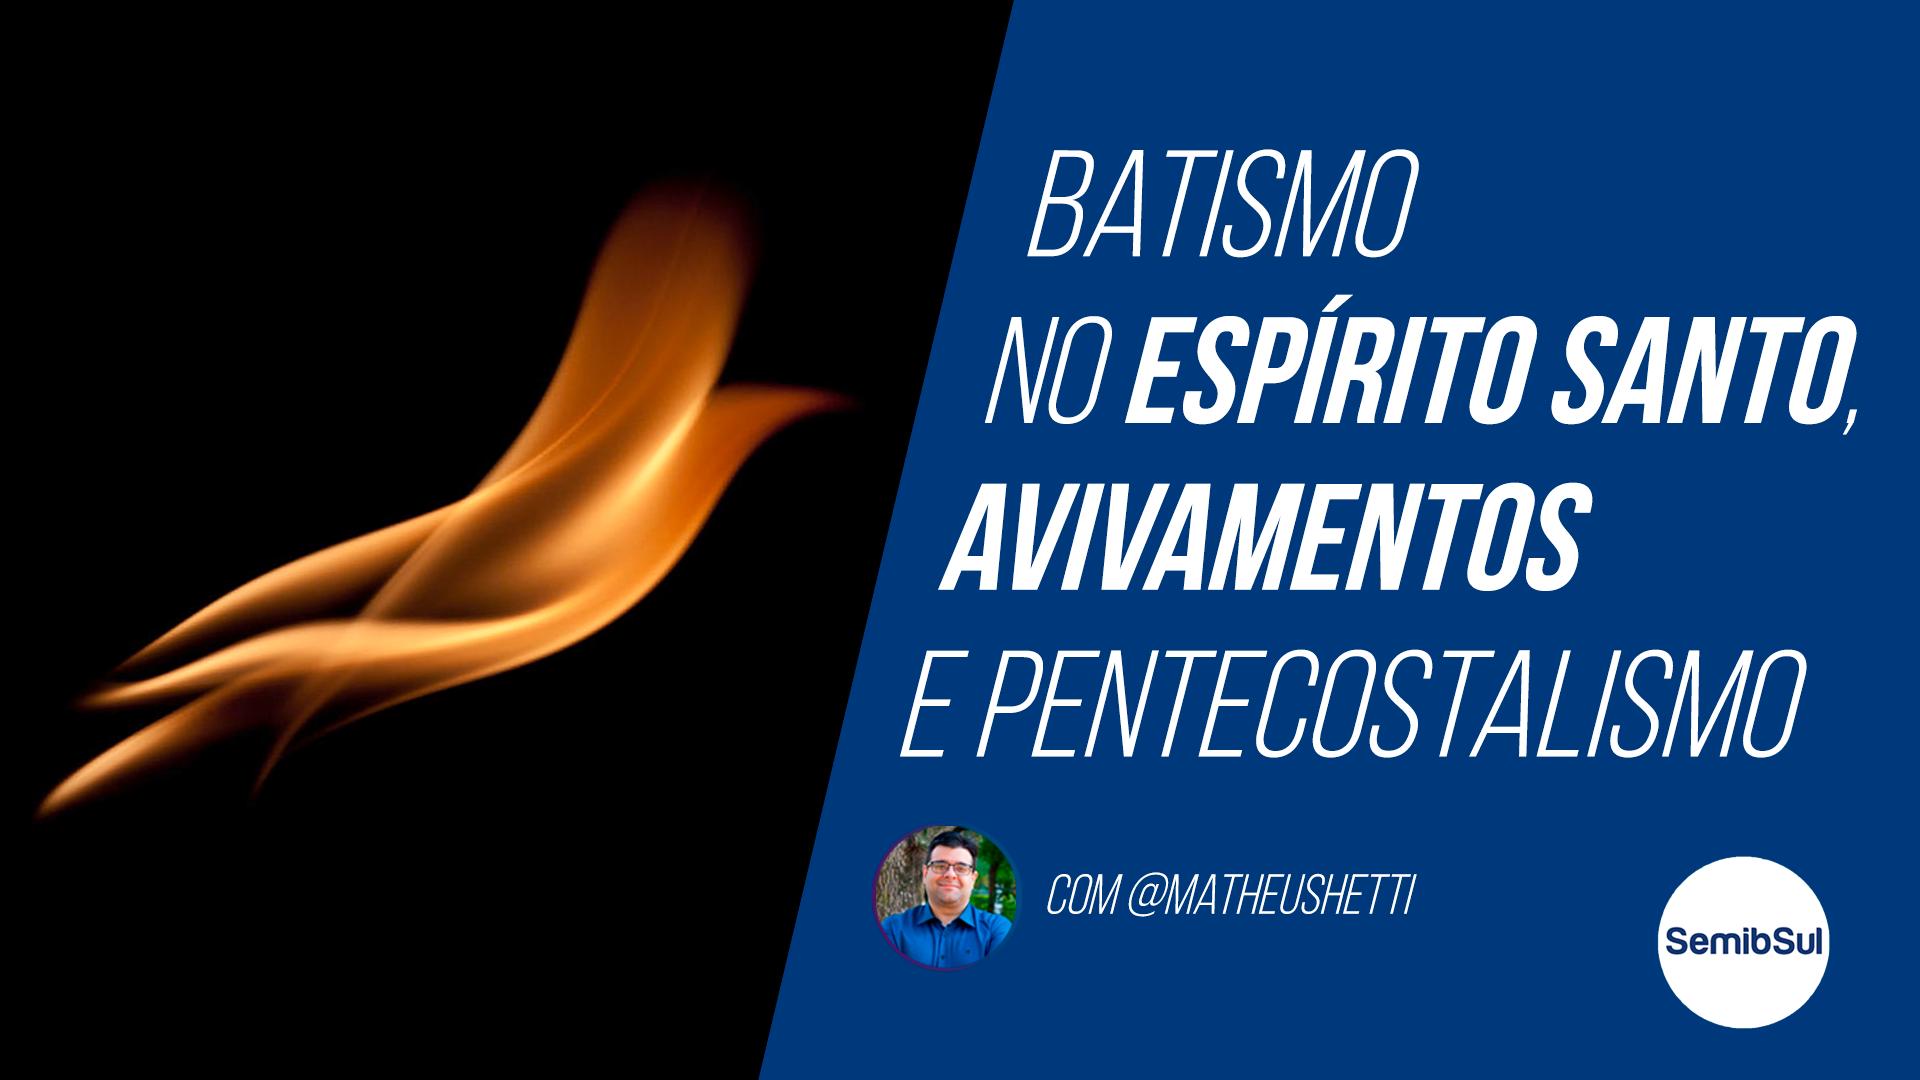 Avivamentos, Dons, Batismo no Espírito Santo e Pentecostalismo – Semib Podcast #30